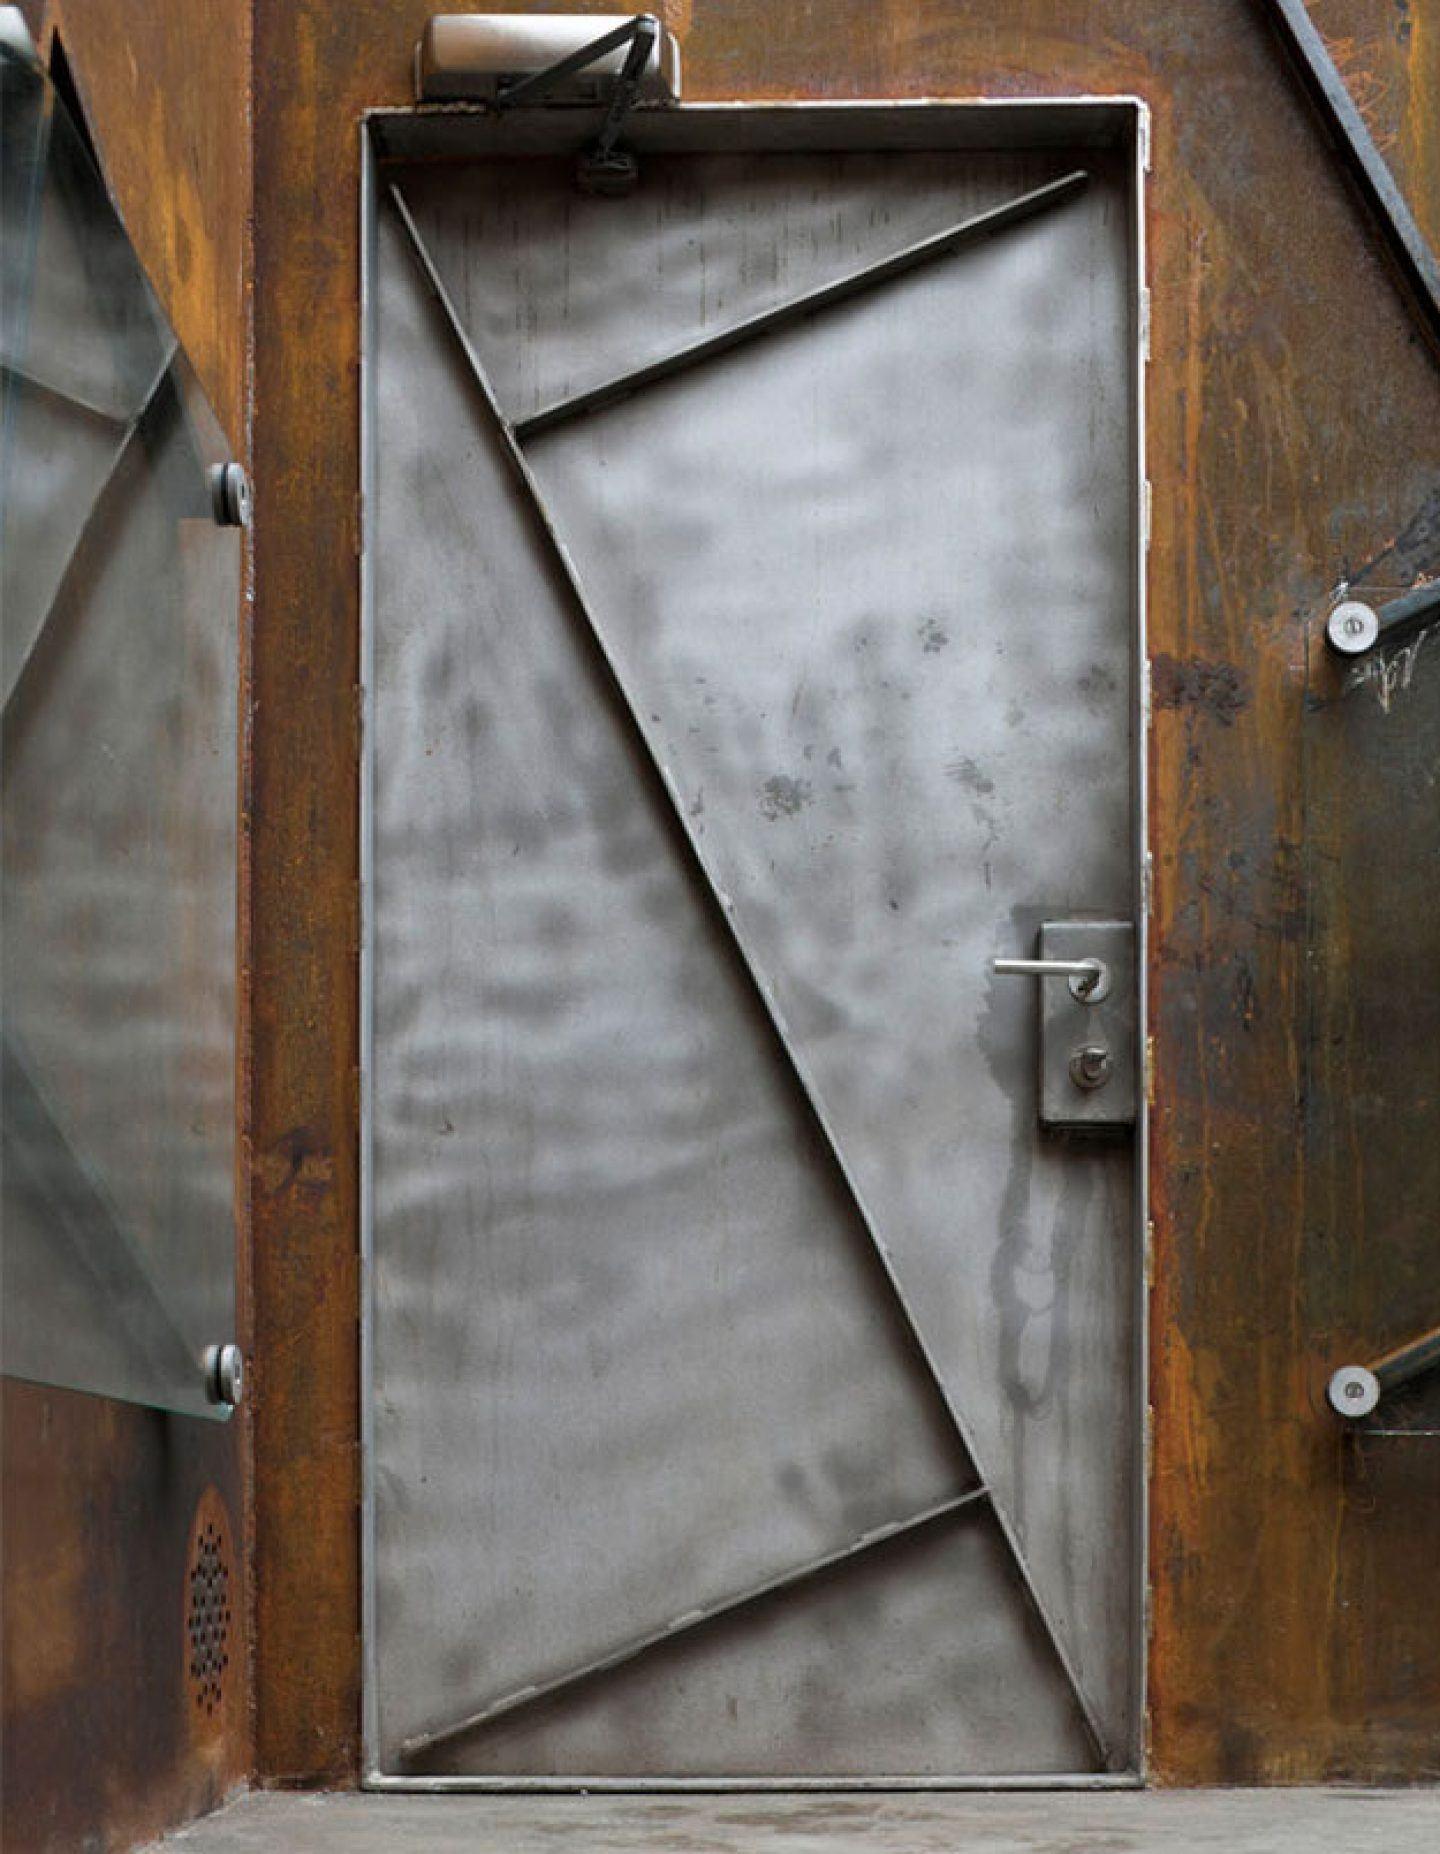 ignant-architecture-manthey-kula-akkarvik-roadside-restroom-12